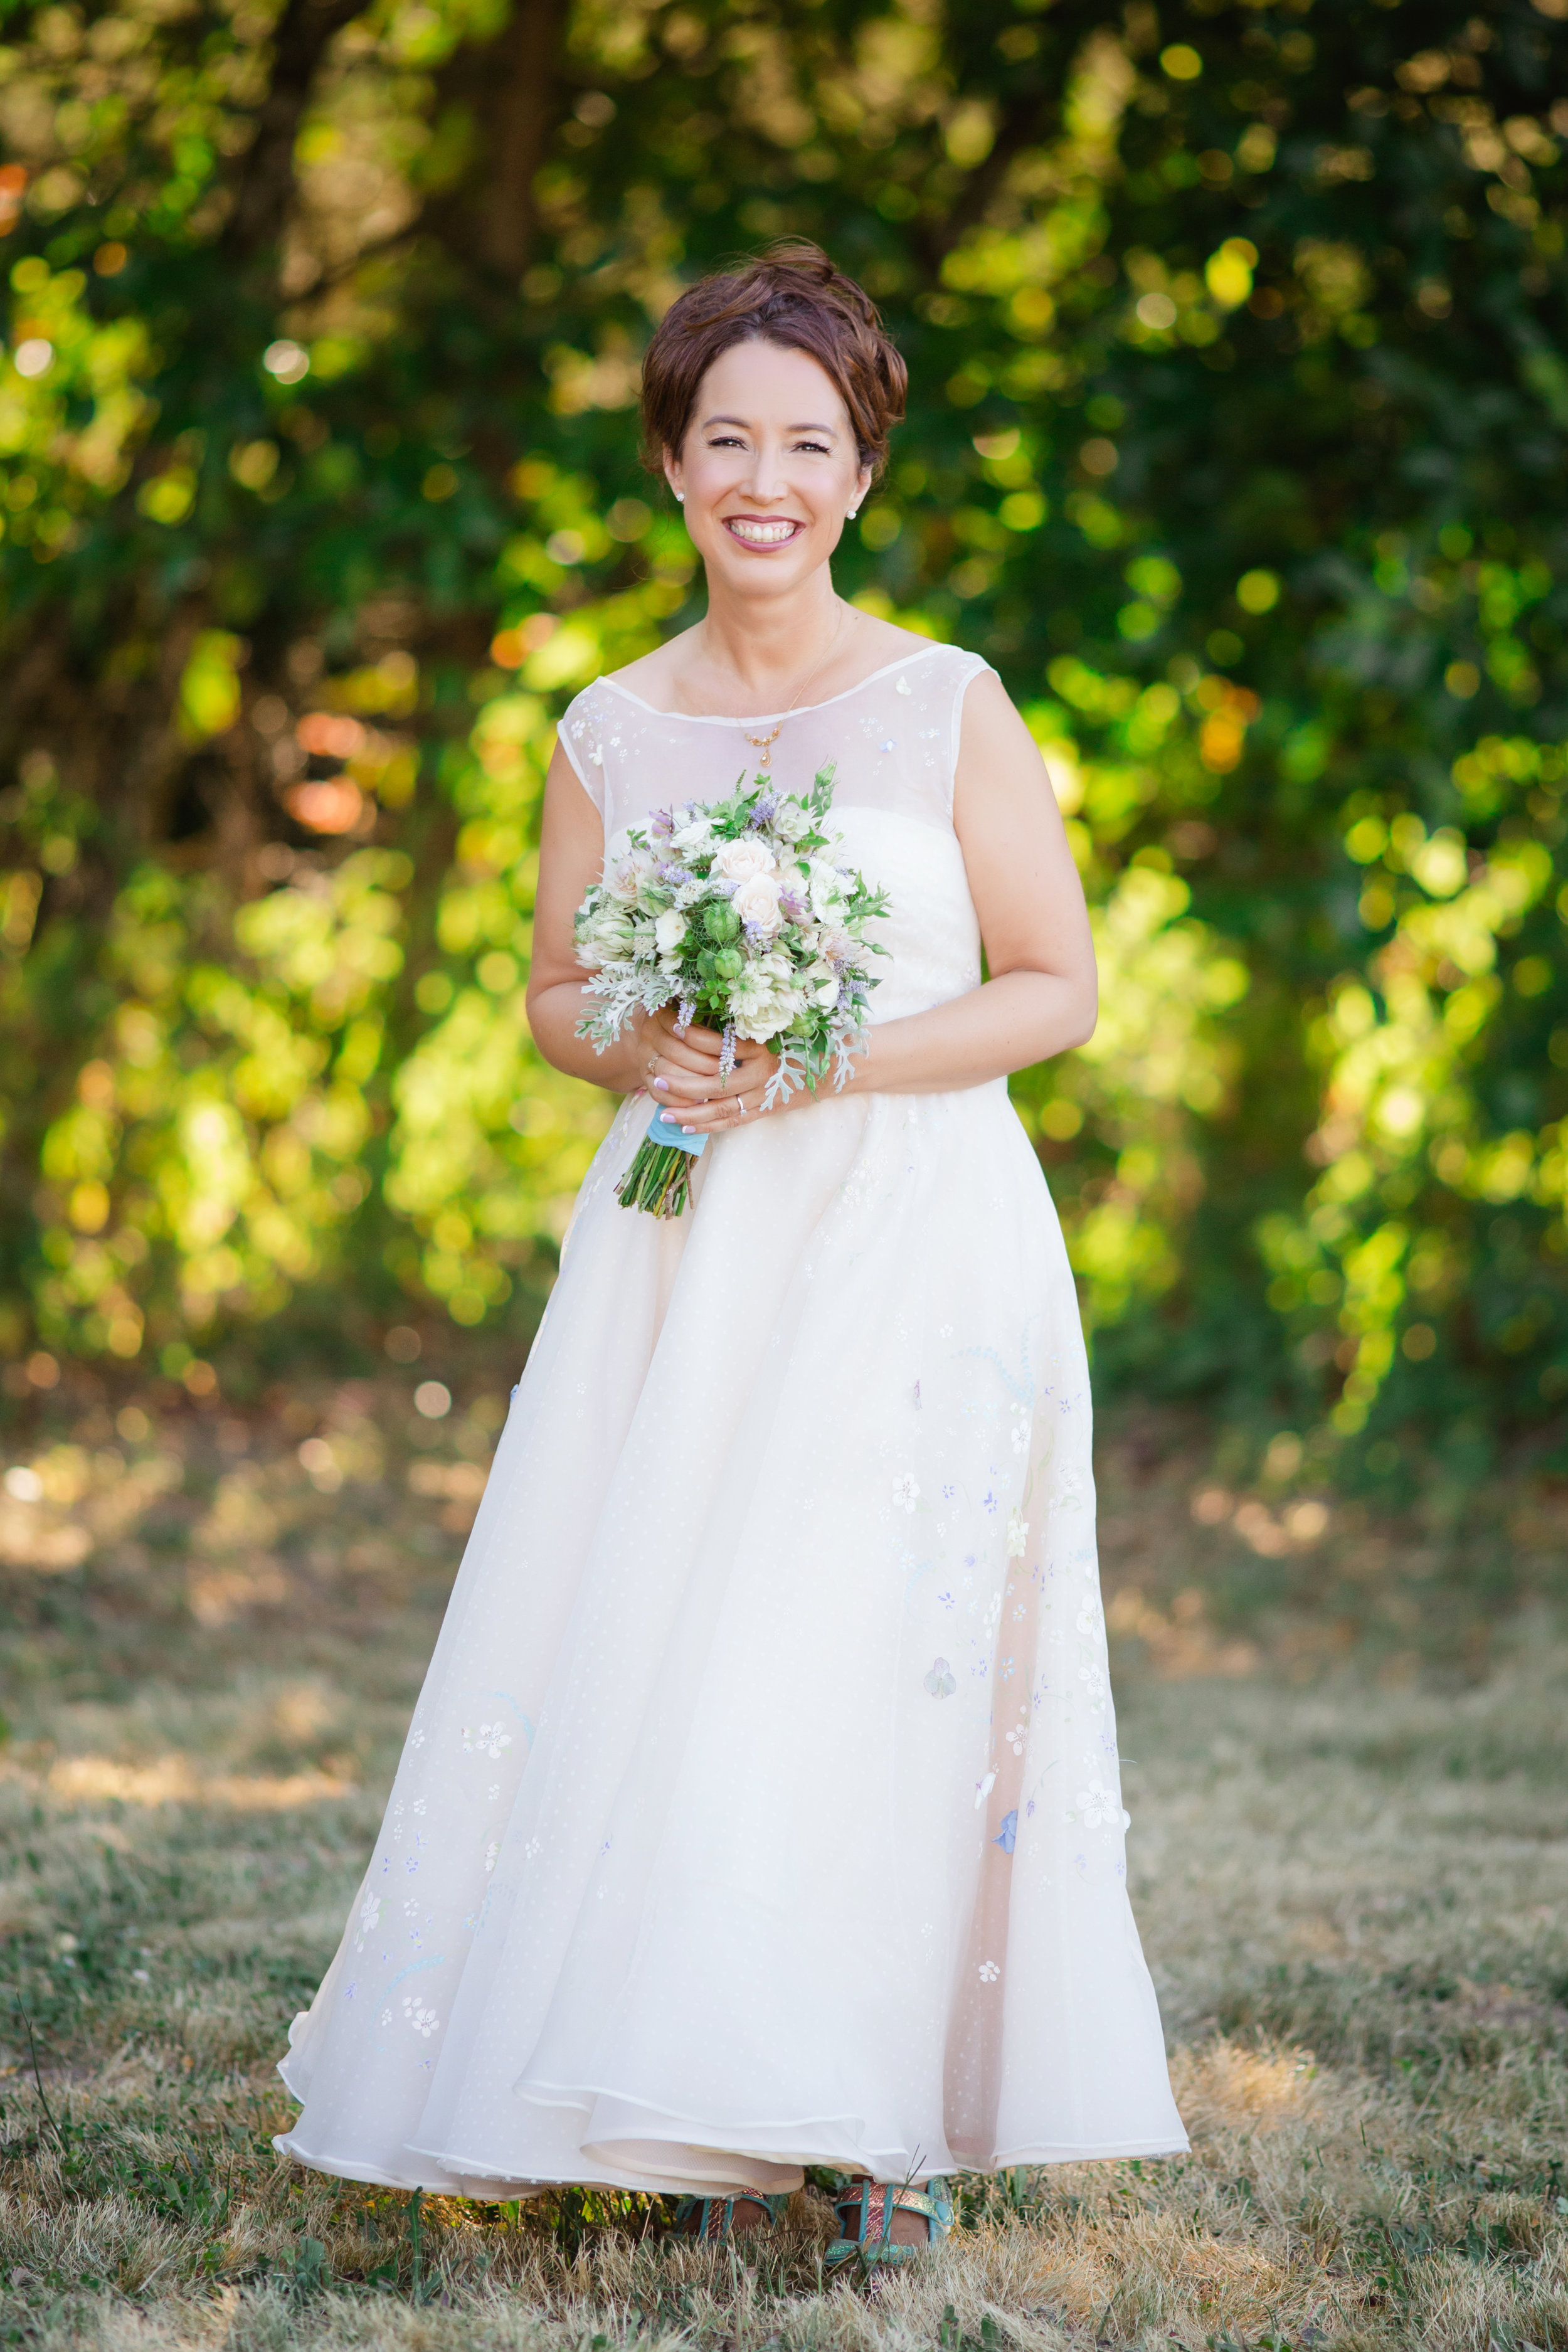 rebecca-michael-wedding-85.jpg